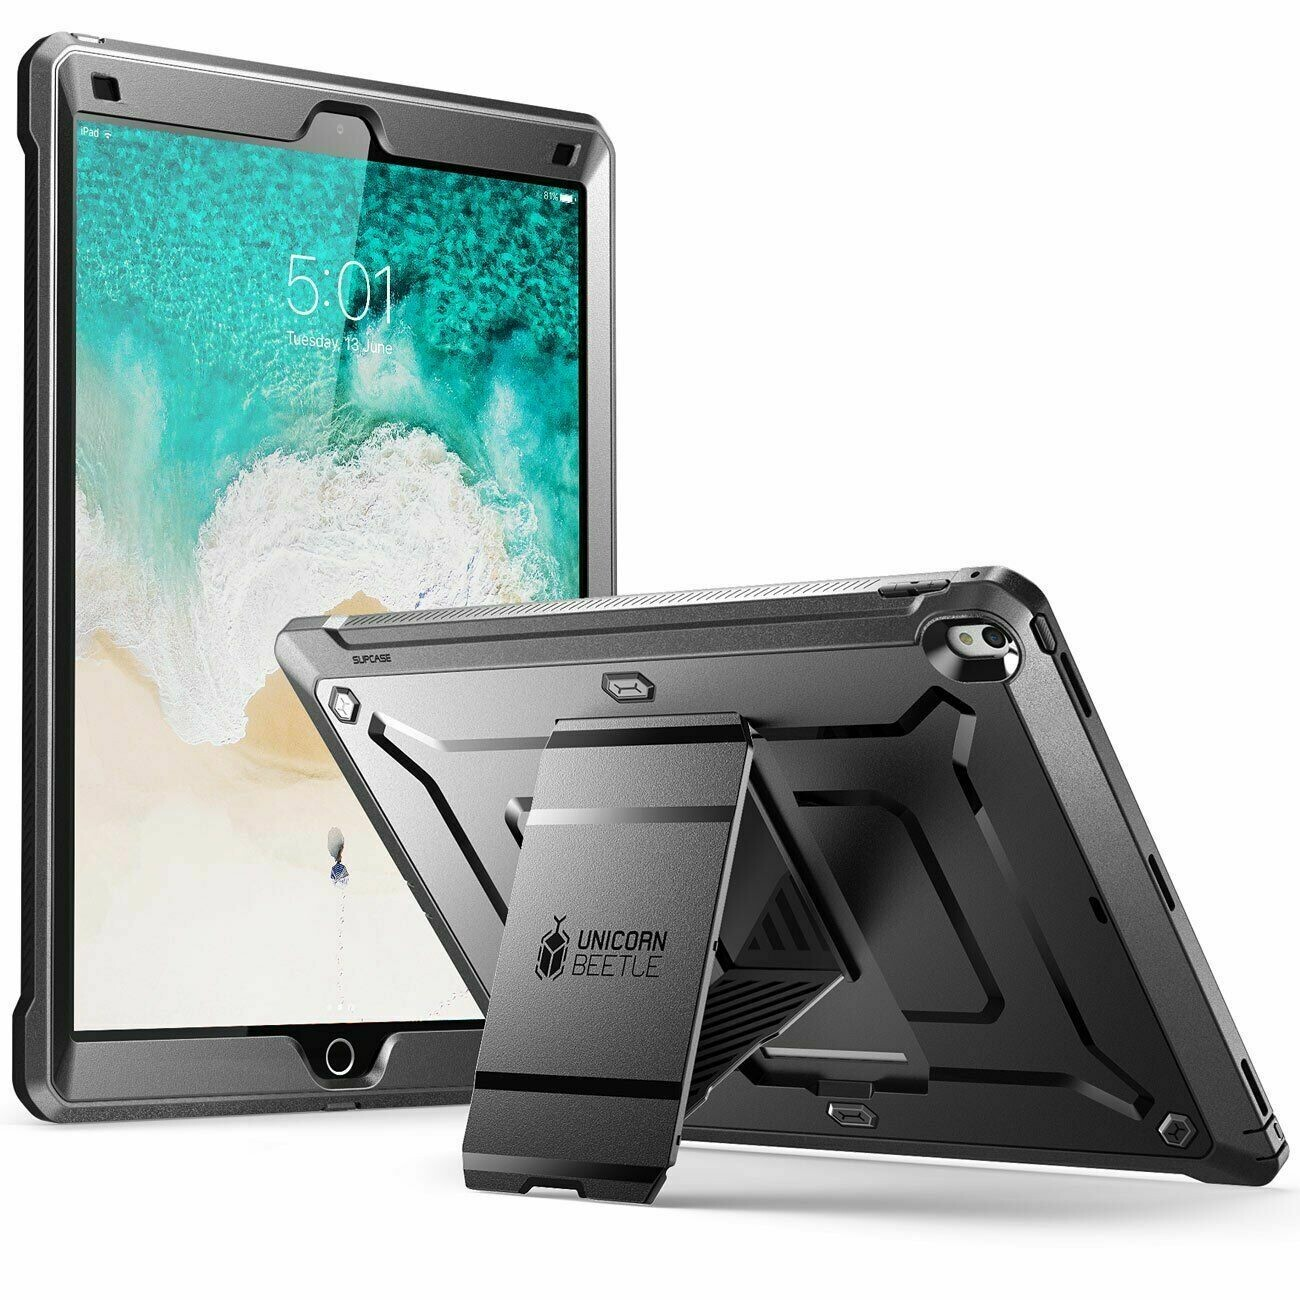 Case Protector Apple iPad Pro 12,9 pulgadas 2017 A1670 A1671 A1821 Recios - Negro